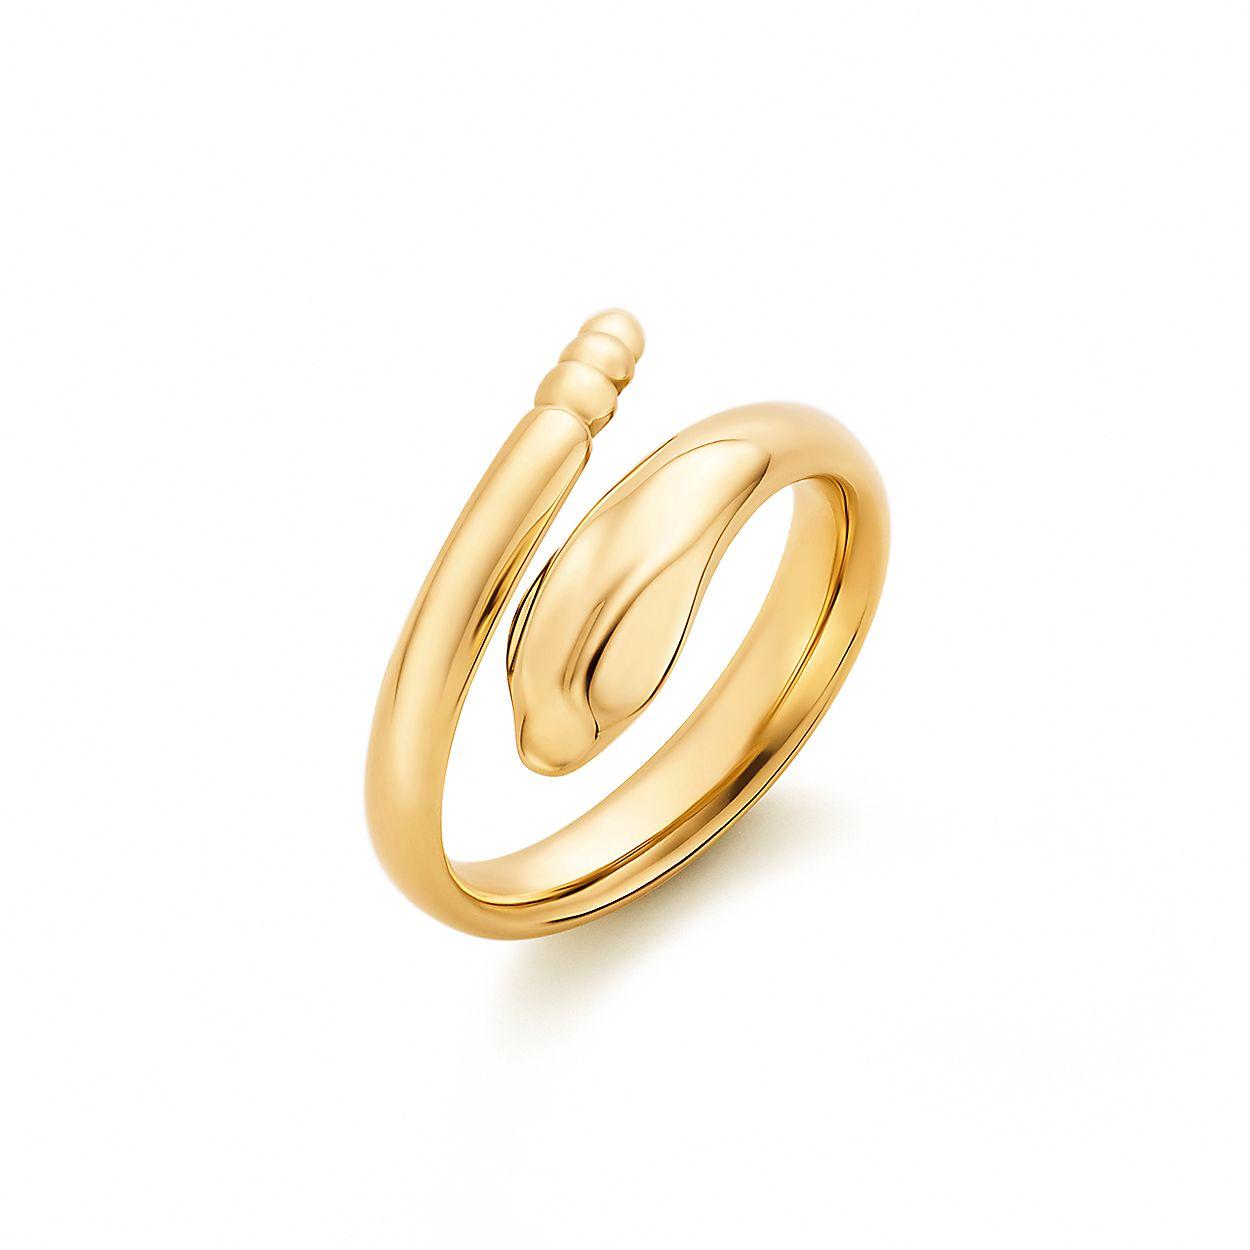 9dd8e6d80 Elsa Peretti® Snake ring in 18k gold. | Tiffany & Co.